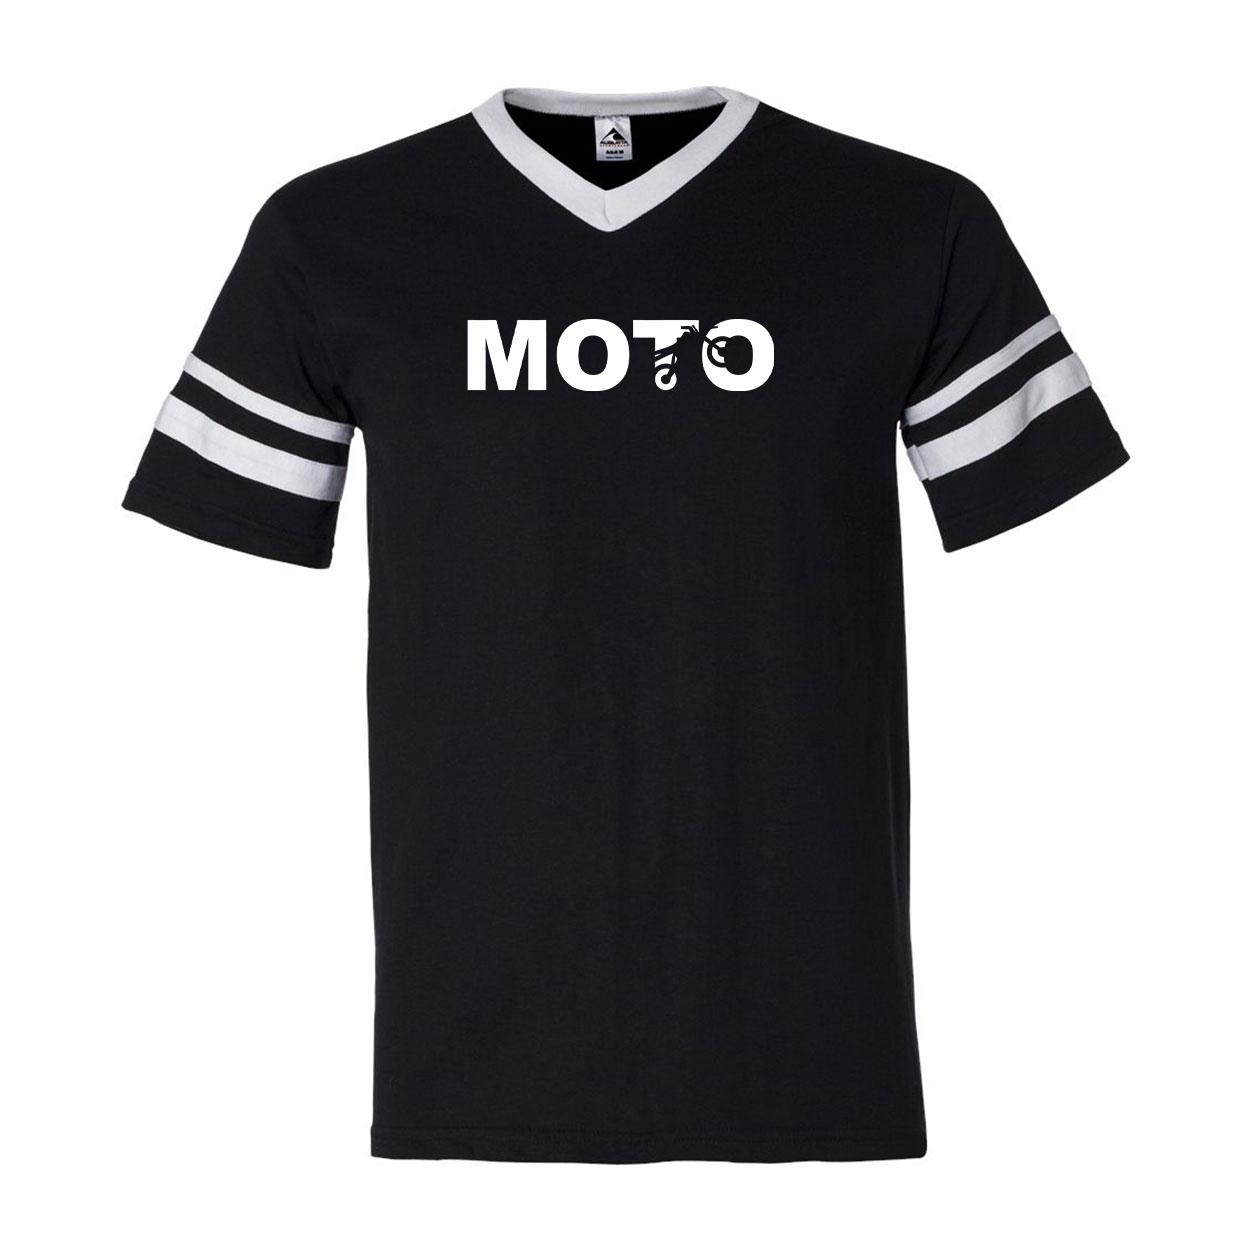 Moto Wheelie Logo Classic Premium Striped Jersey T-Shirt Black/White (White Logo)